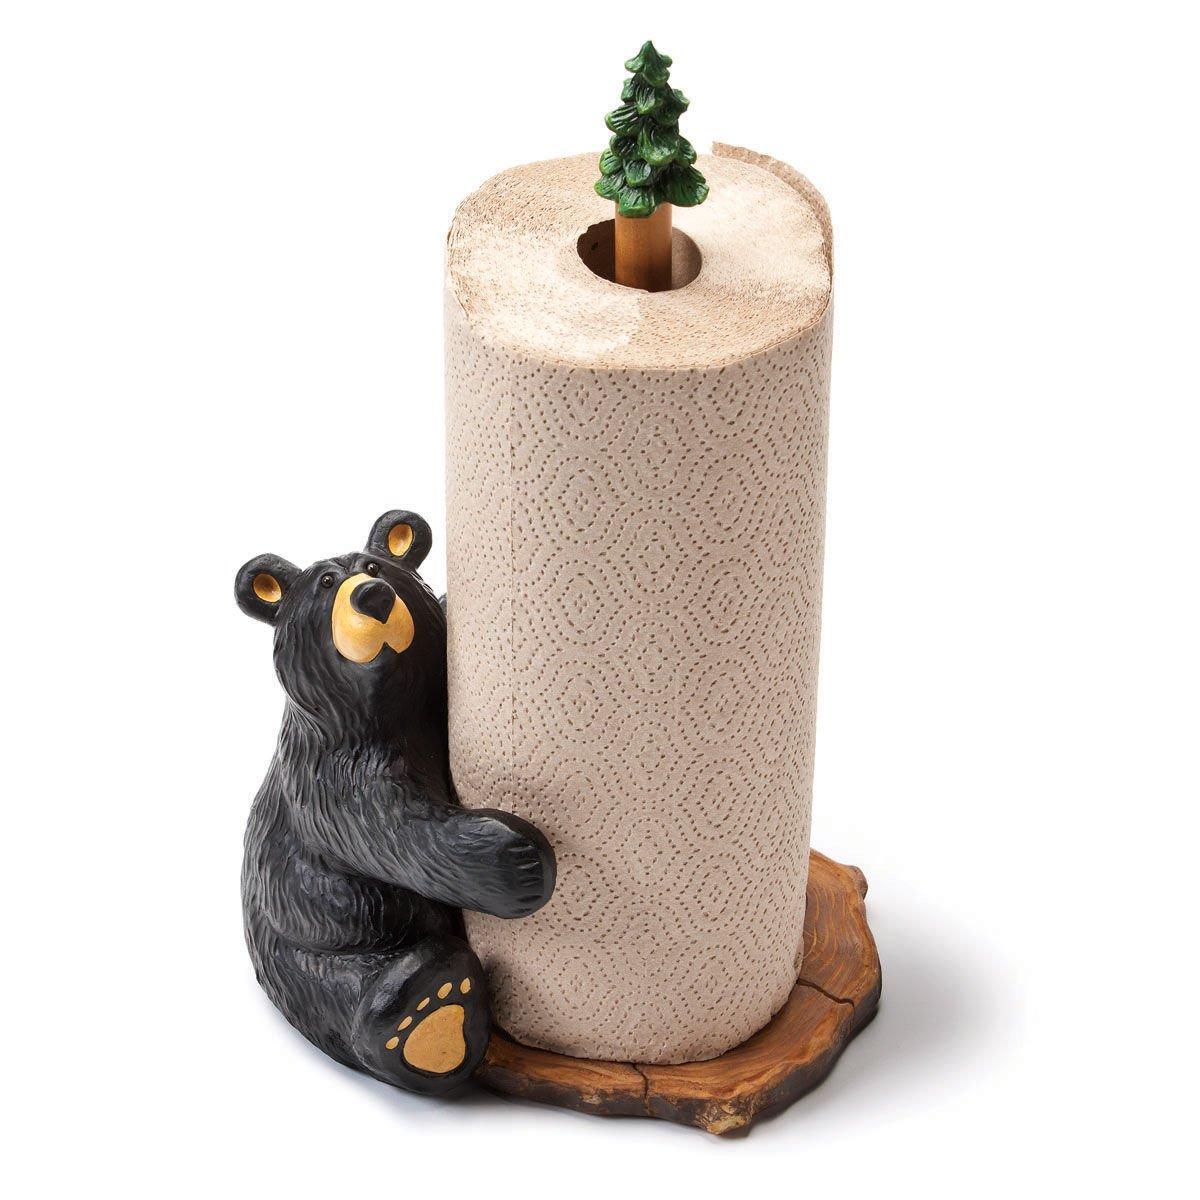 Jeff Fleming Bearfoots Brawnie Bruin Bear Hugging Paper Towel Holder Home Décor Big Sky Carvers COMINHKR073033